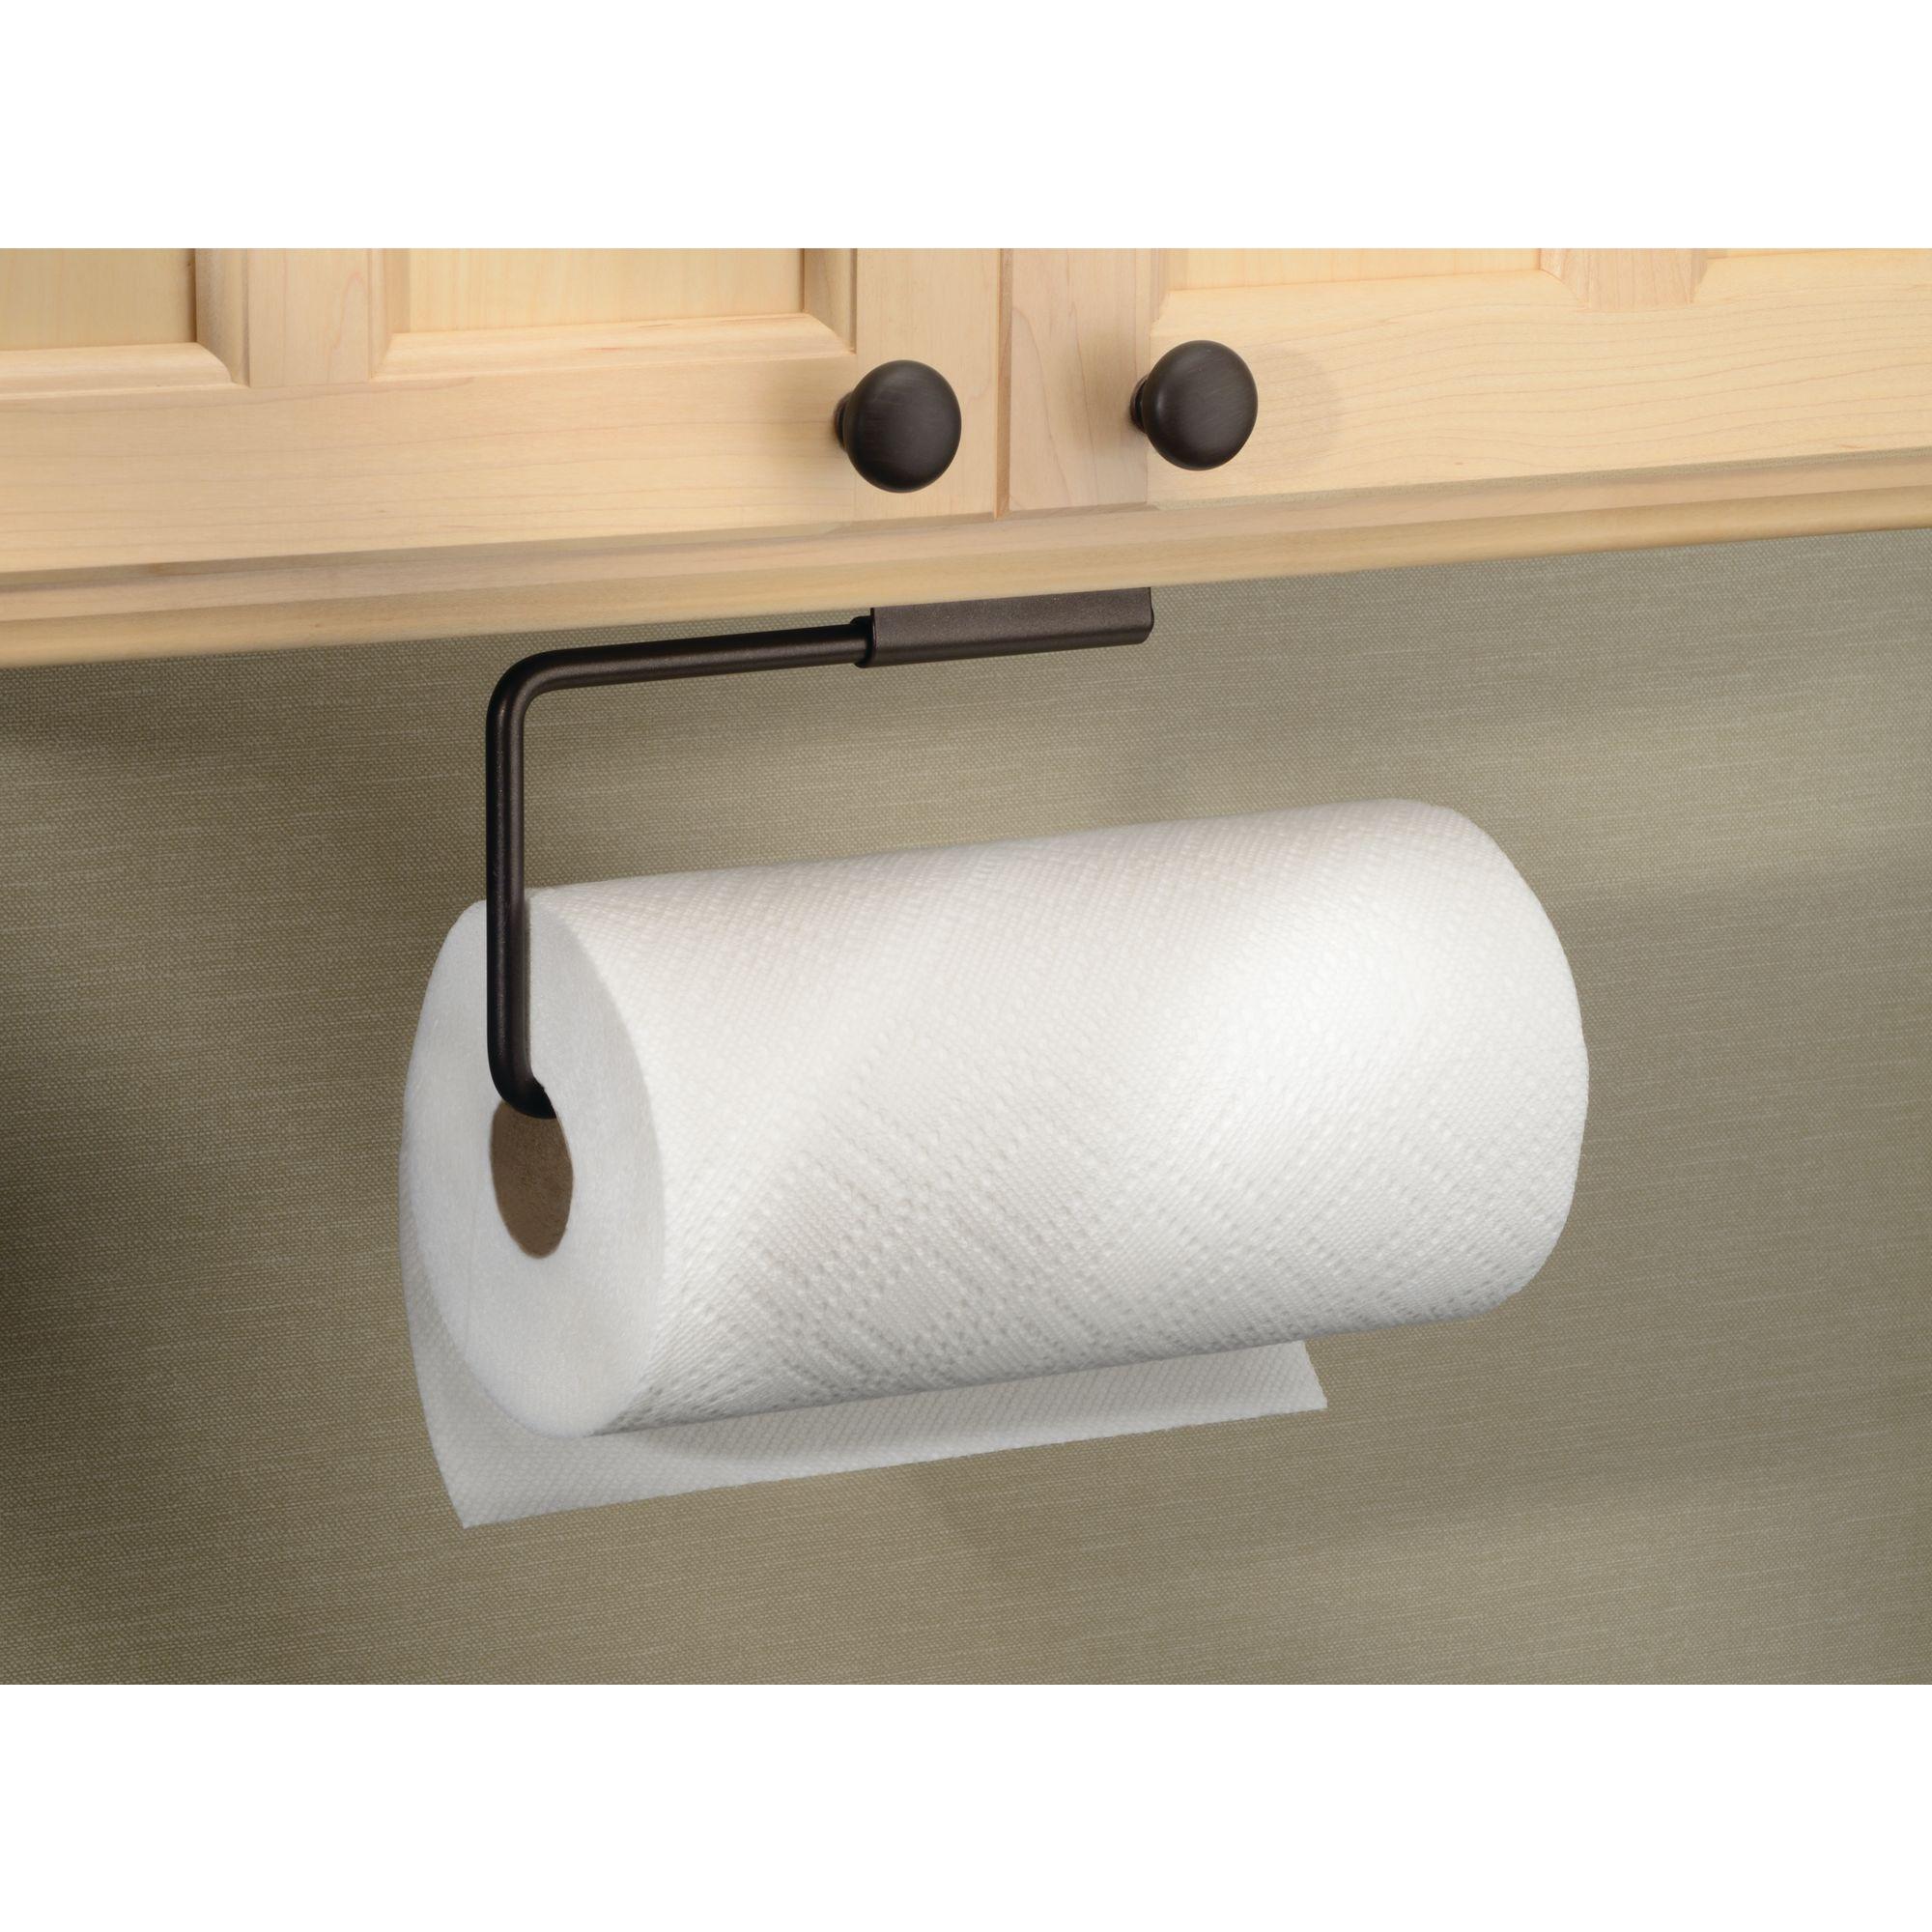 InterDesign Swivel Paper Towel Holder for Kitchen, Wall Mount/Under Cabinet, Bronze